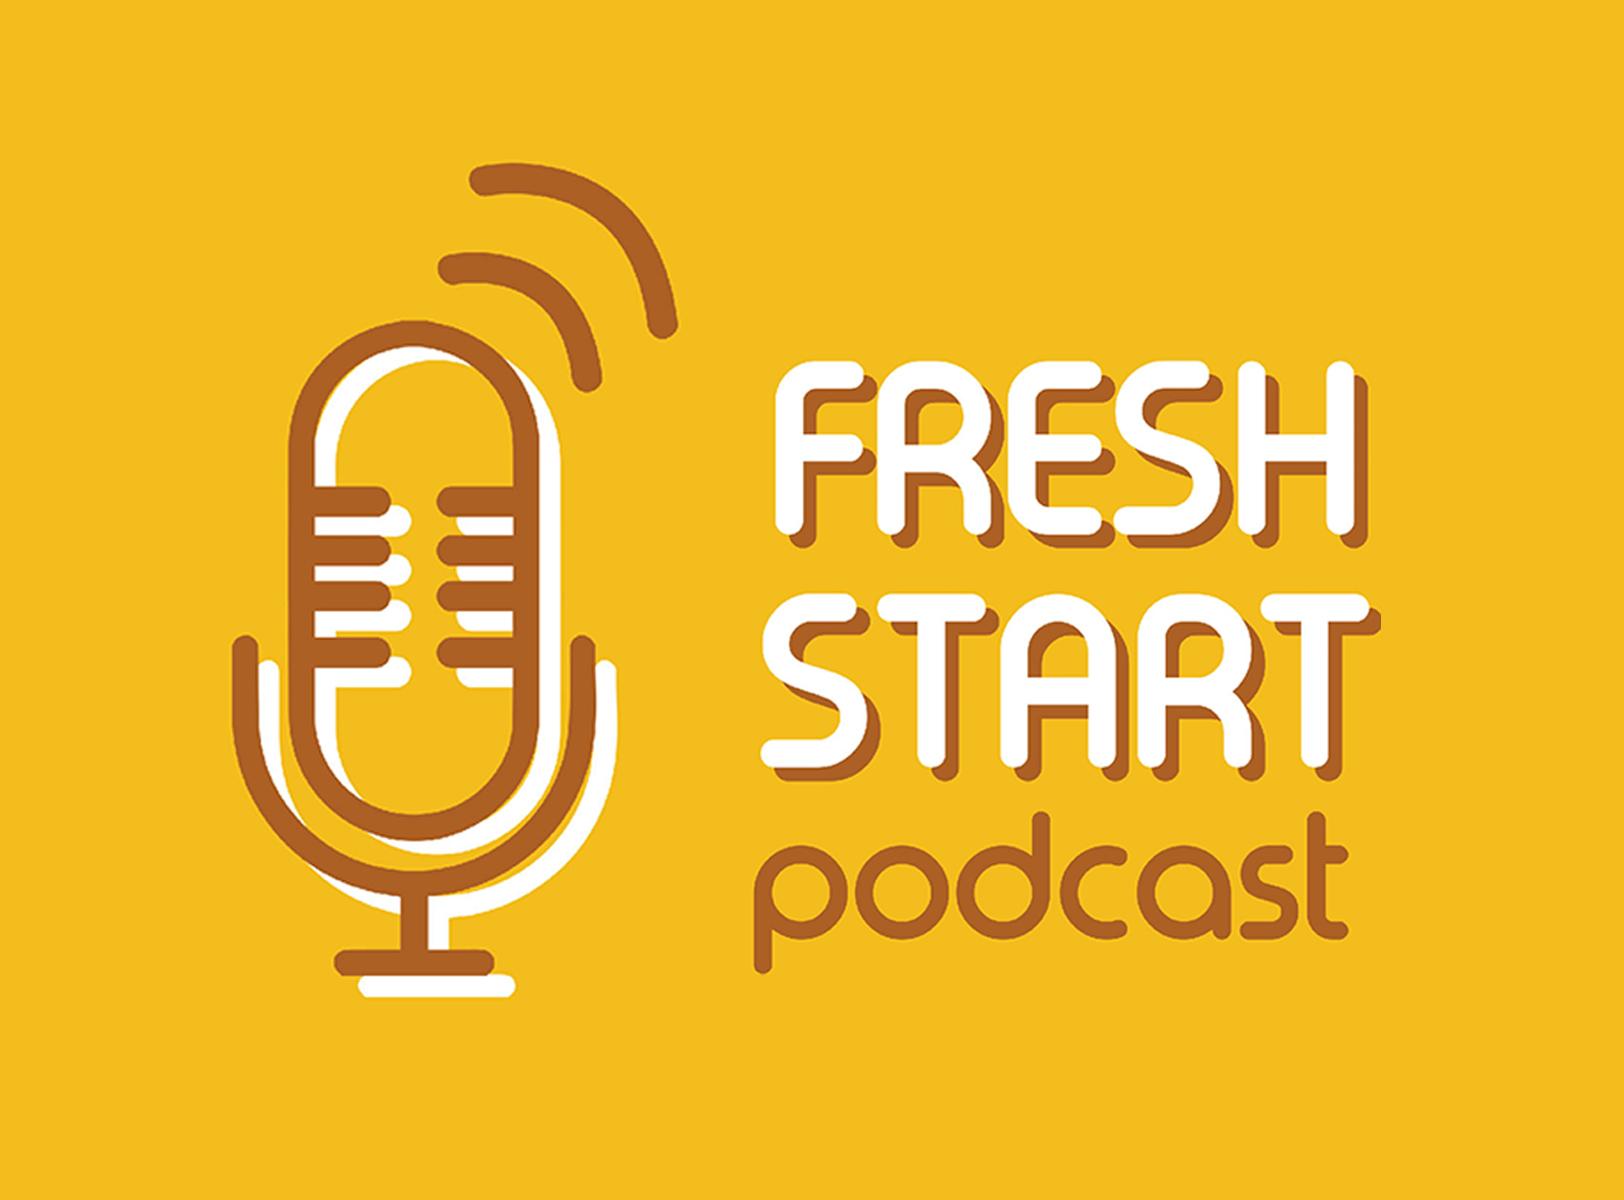 Fresh Start: Podcast News (5/3/2020 Sun.)